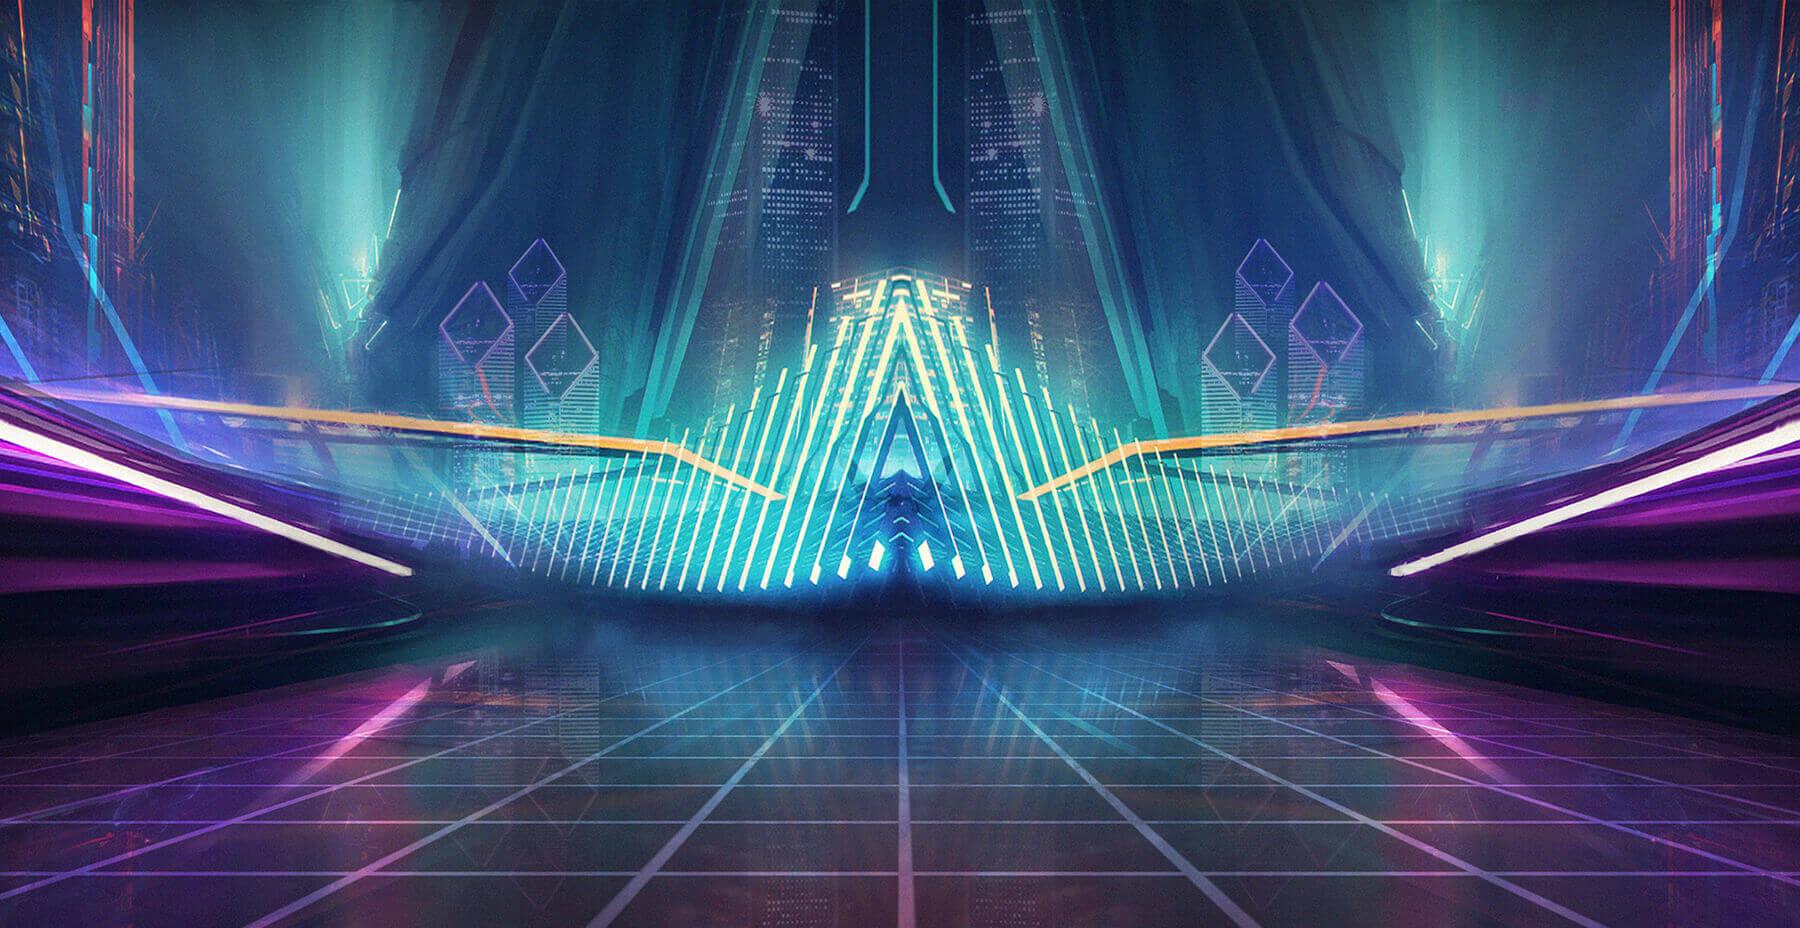 Virtual reality neon backdrop